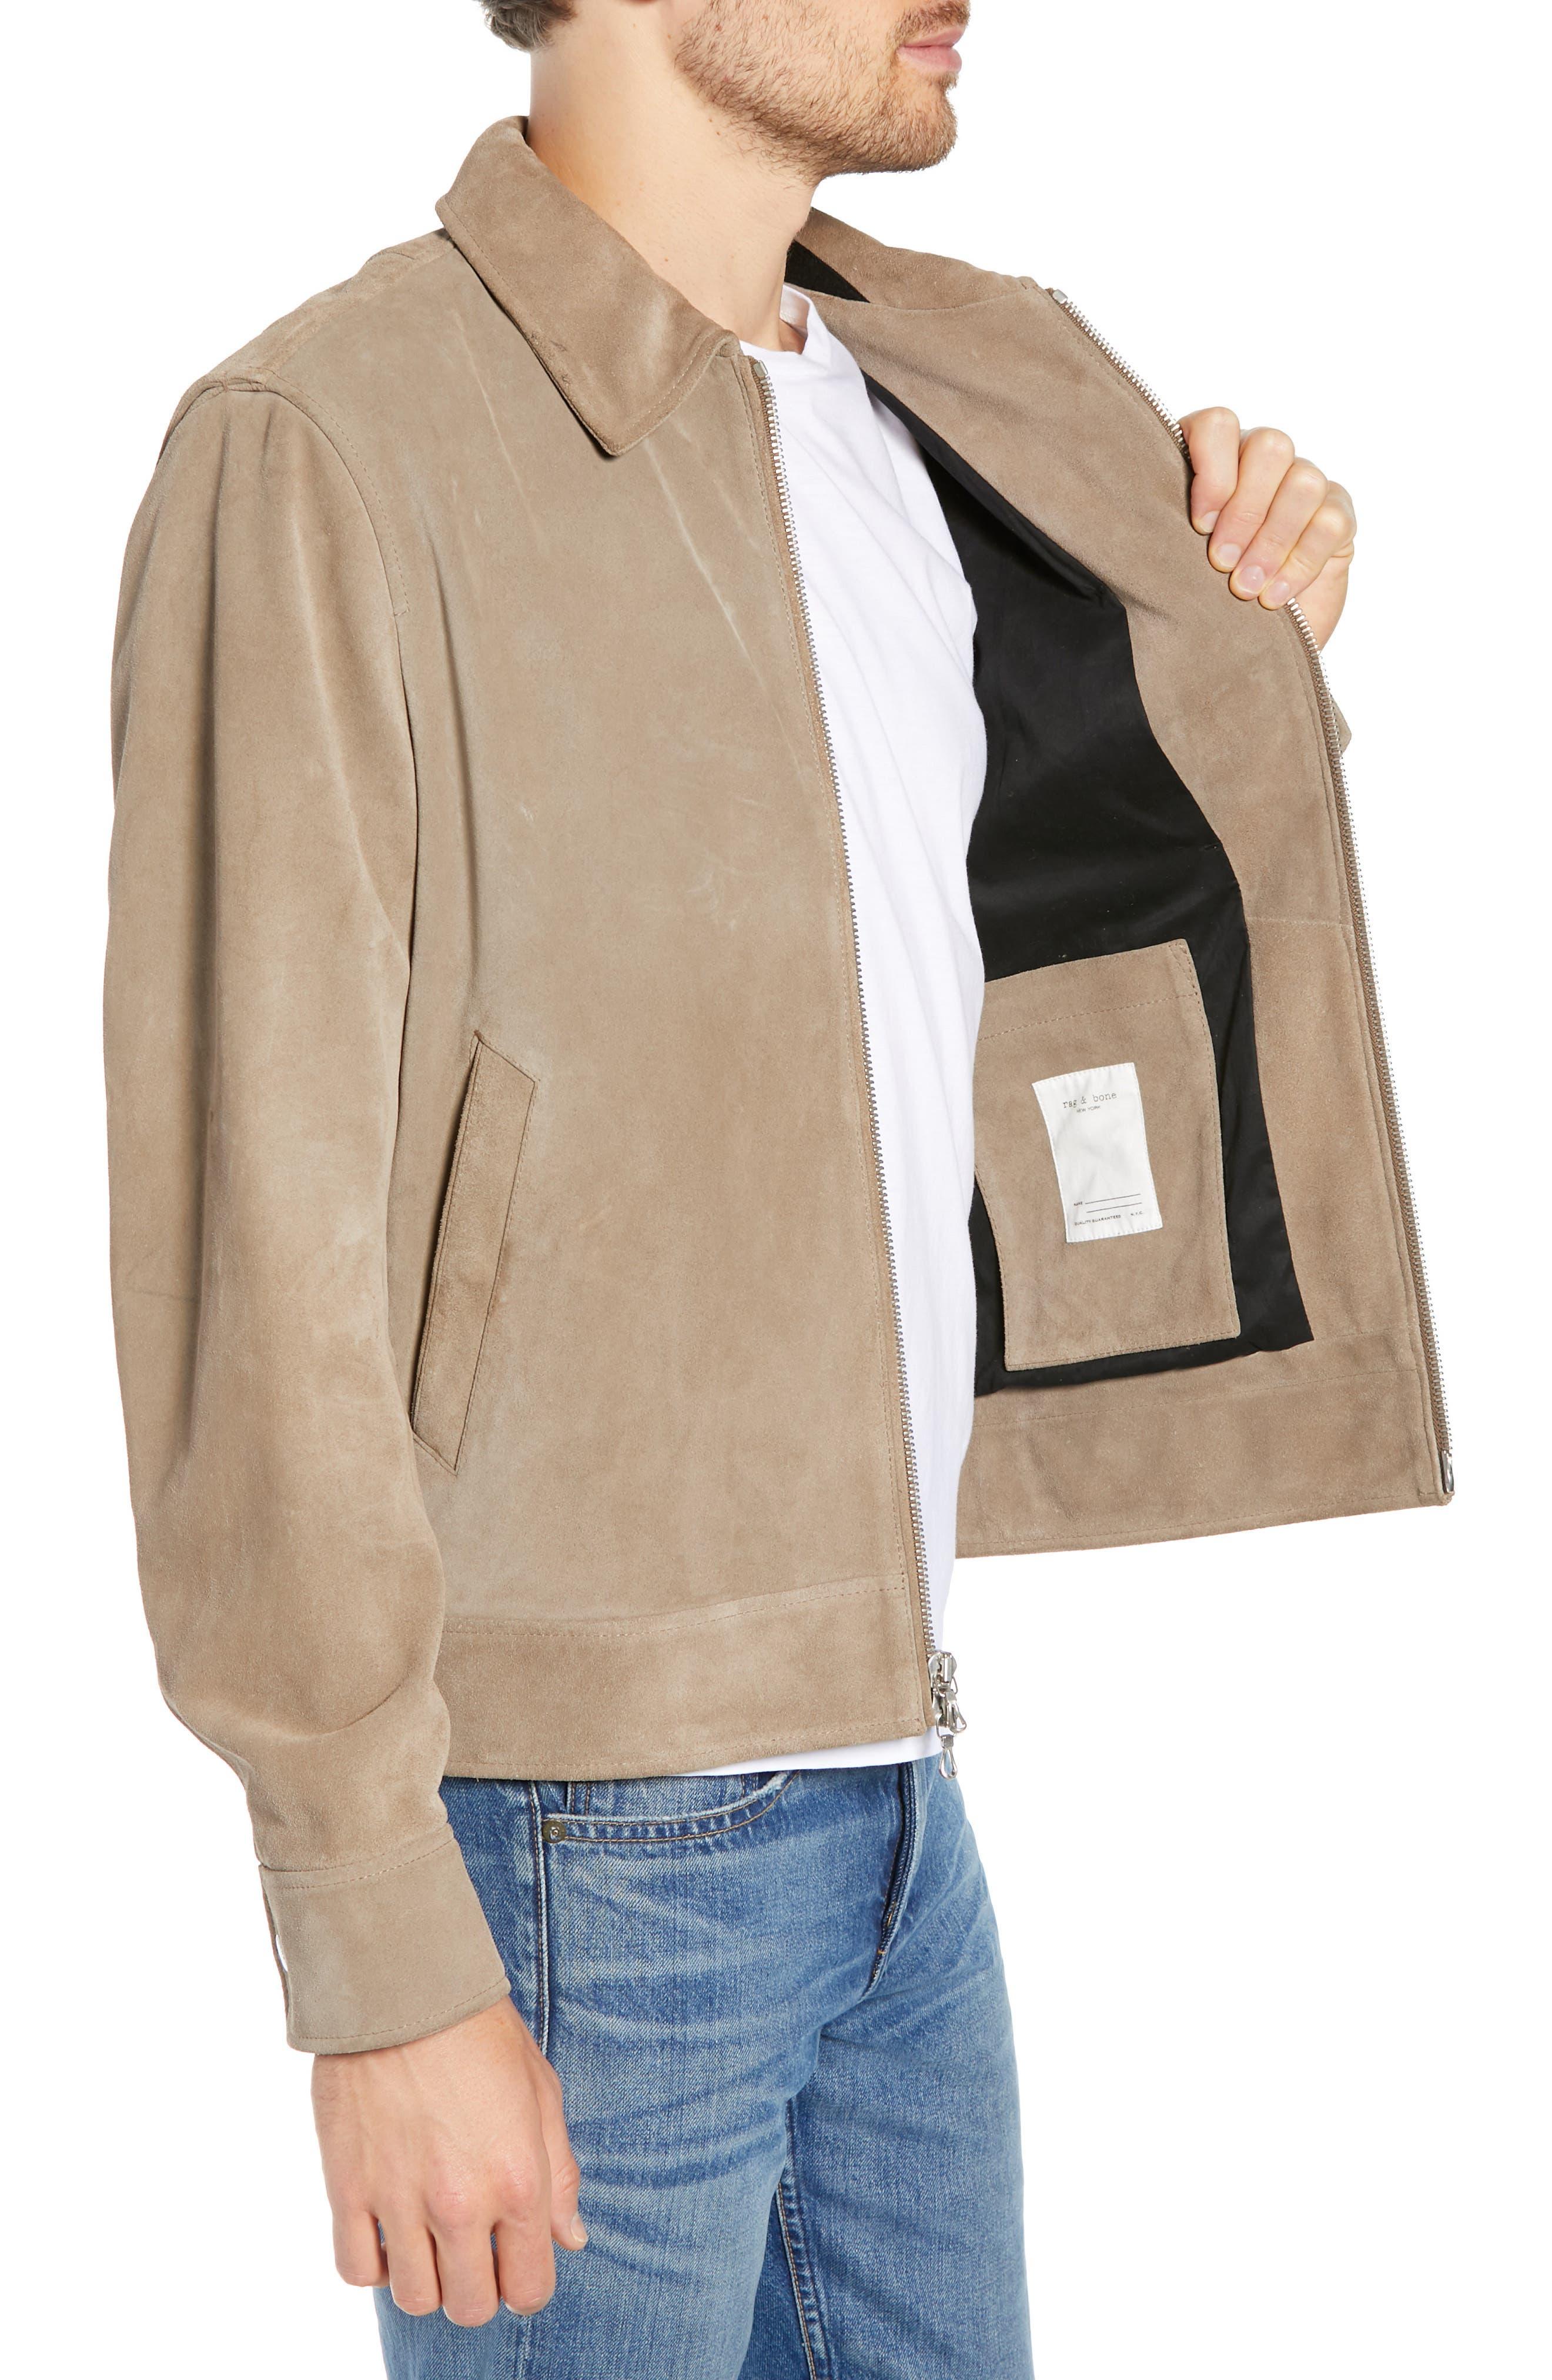 RAG & BONE,                             Regular Fit Suede Garage Jacket,                             Alternate thumbnail 3, color,                             CEMENT